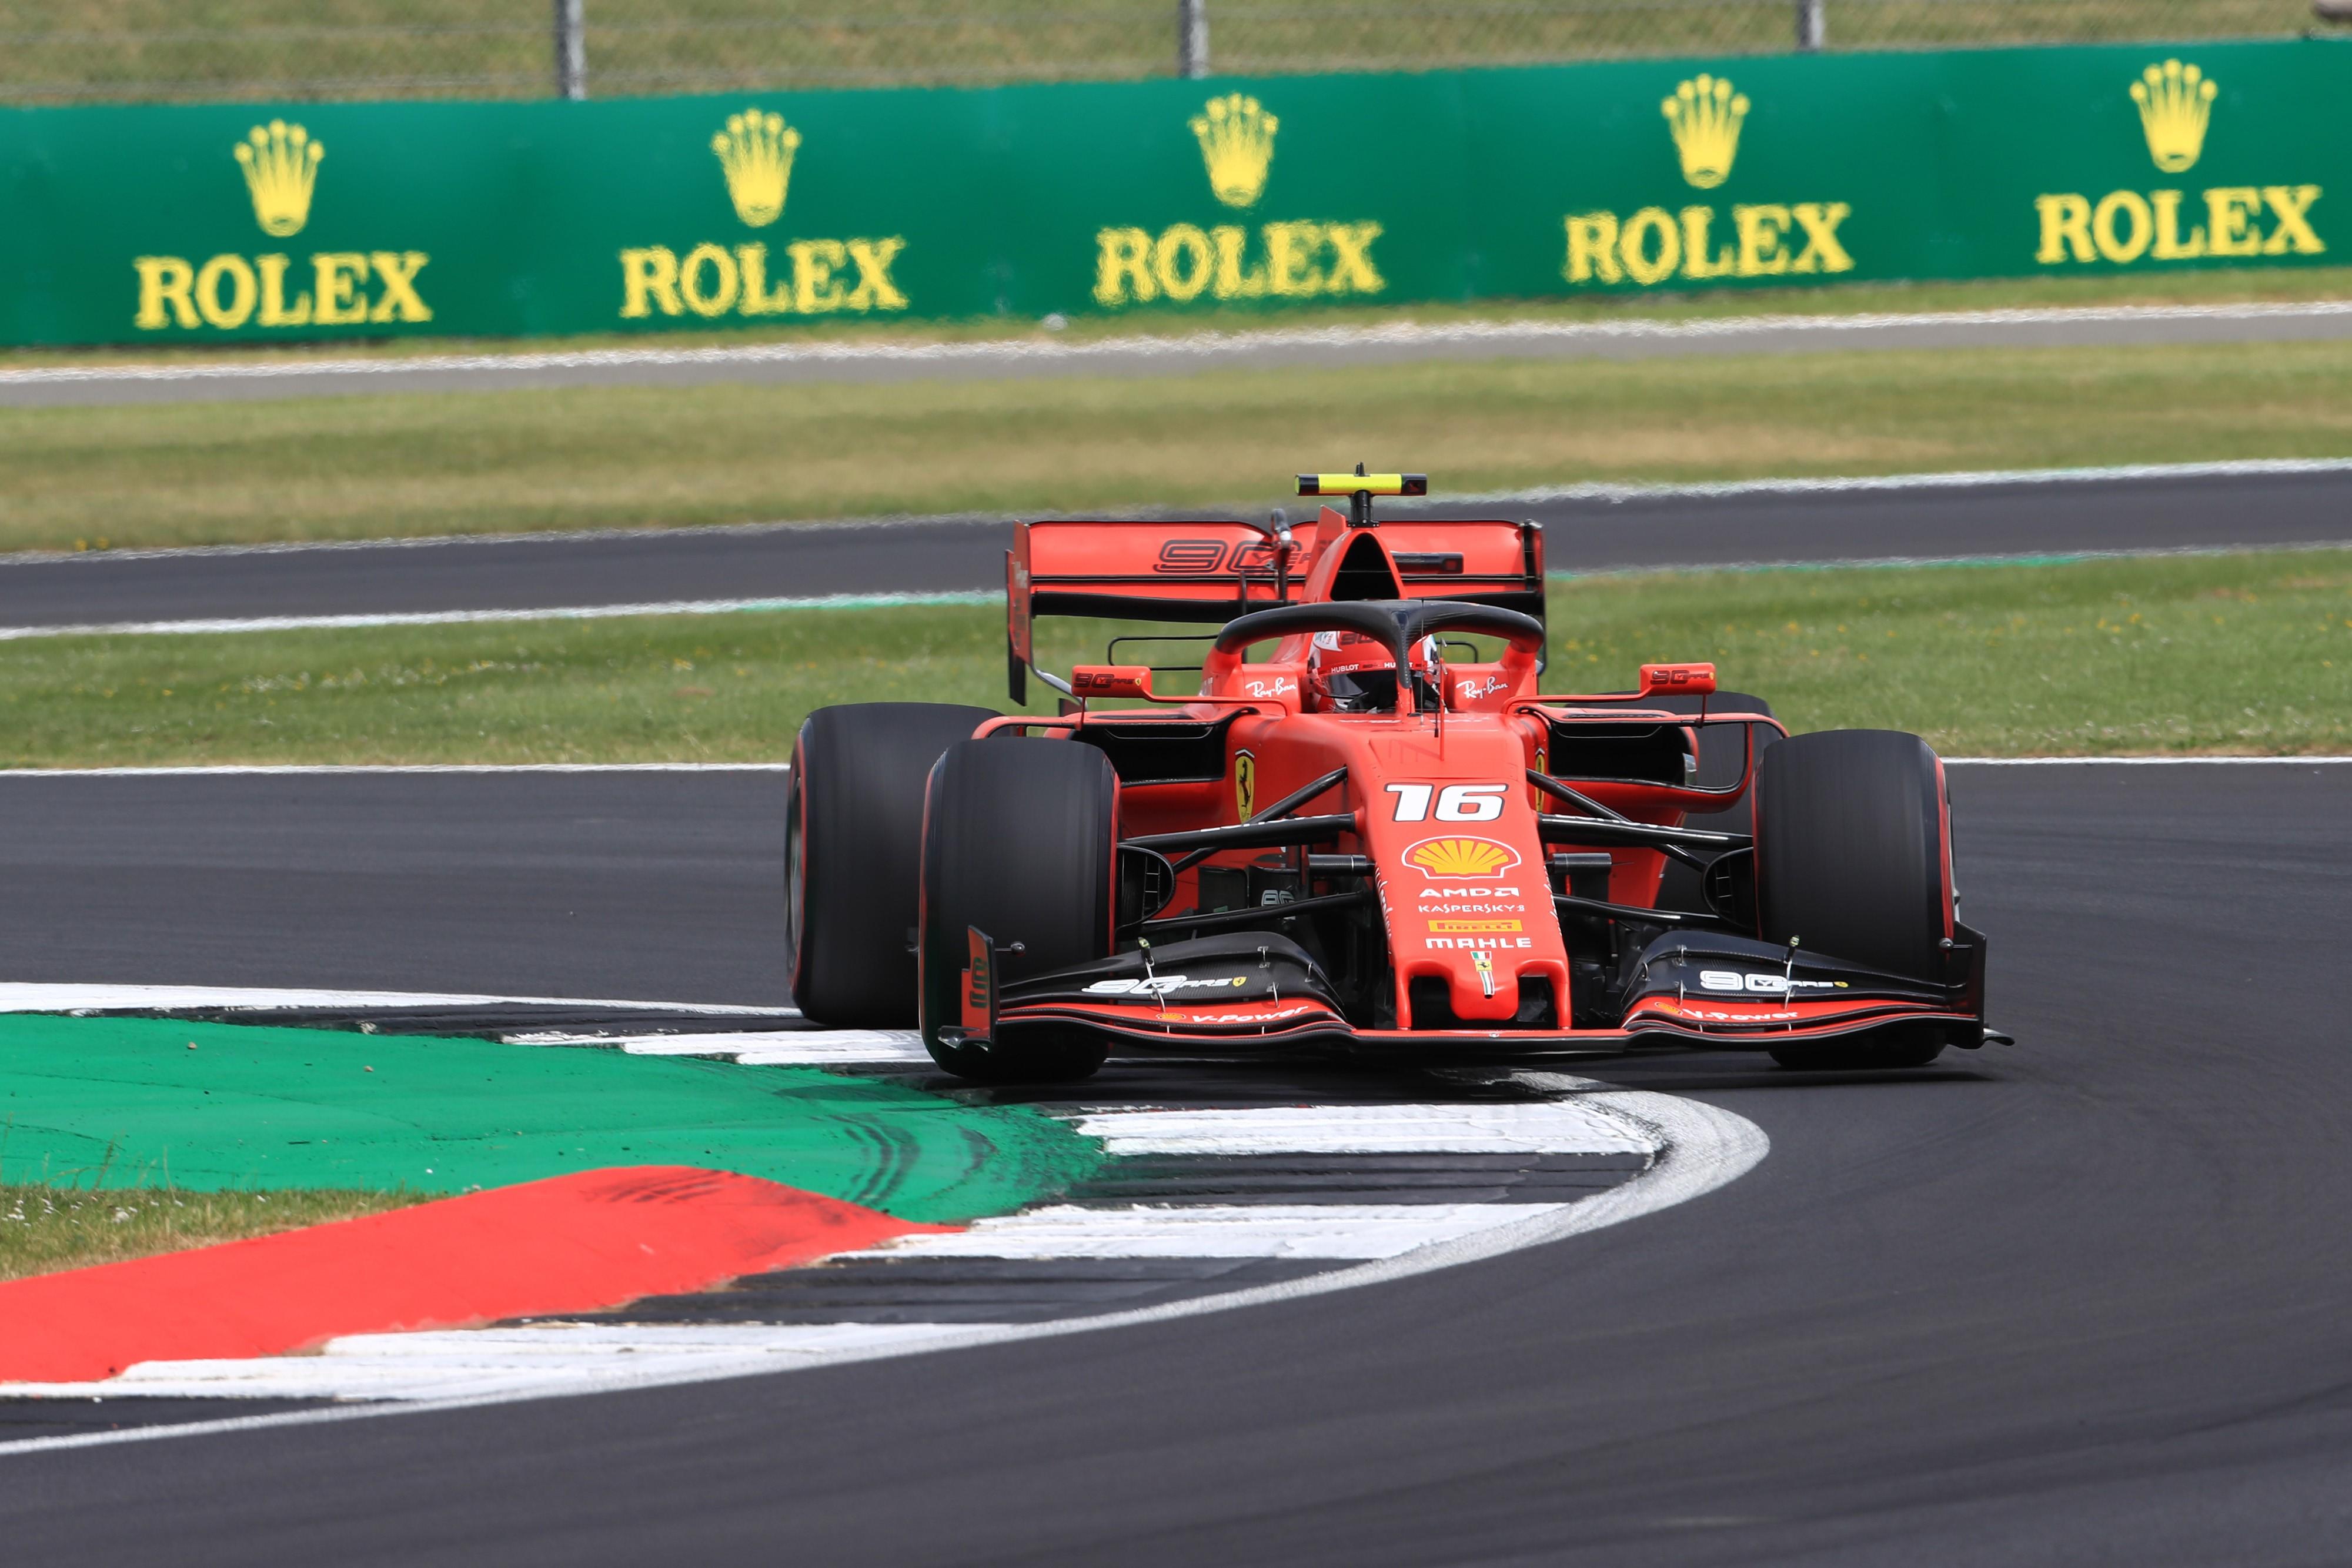 Charles Leclerc (Ferrari) au Grand Prix de Grande Bretagne 2019